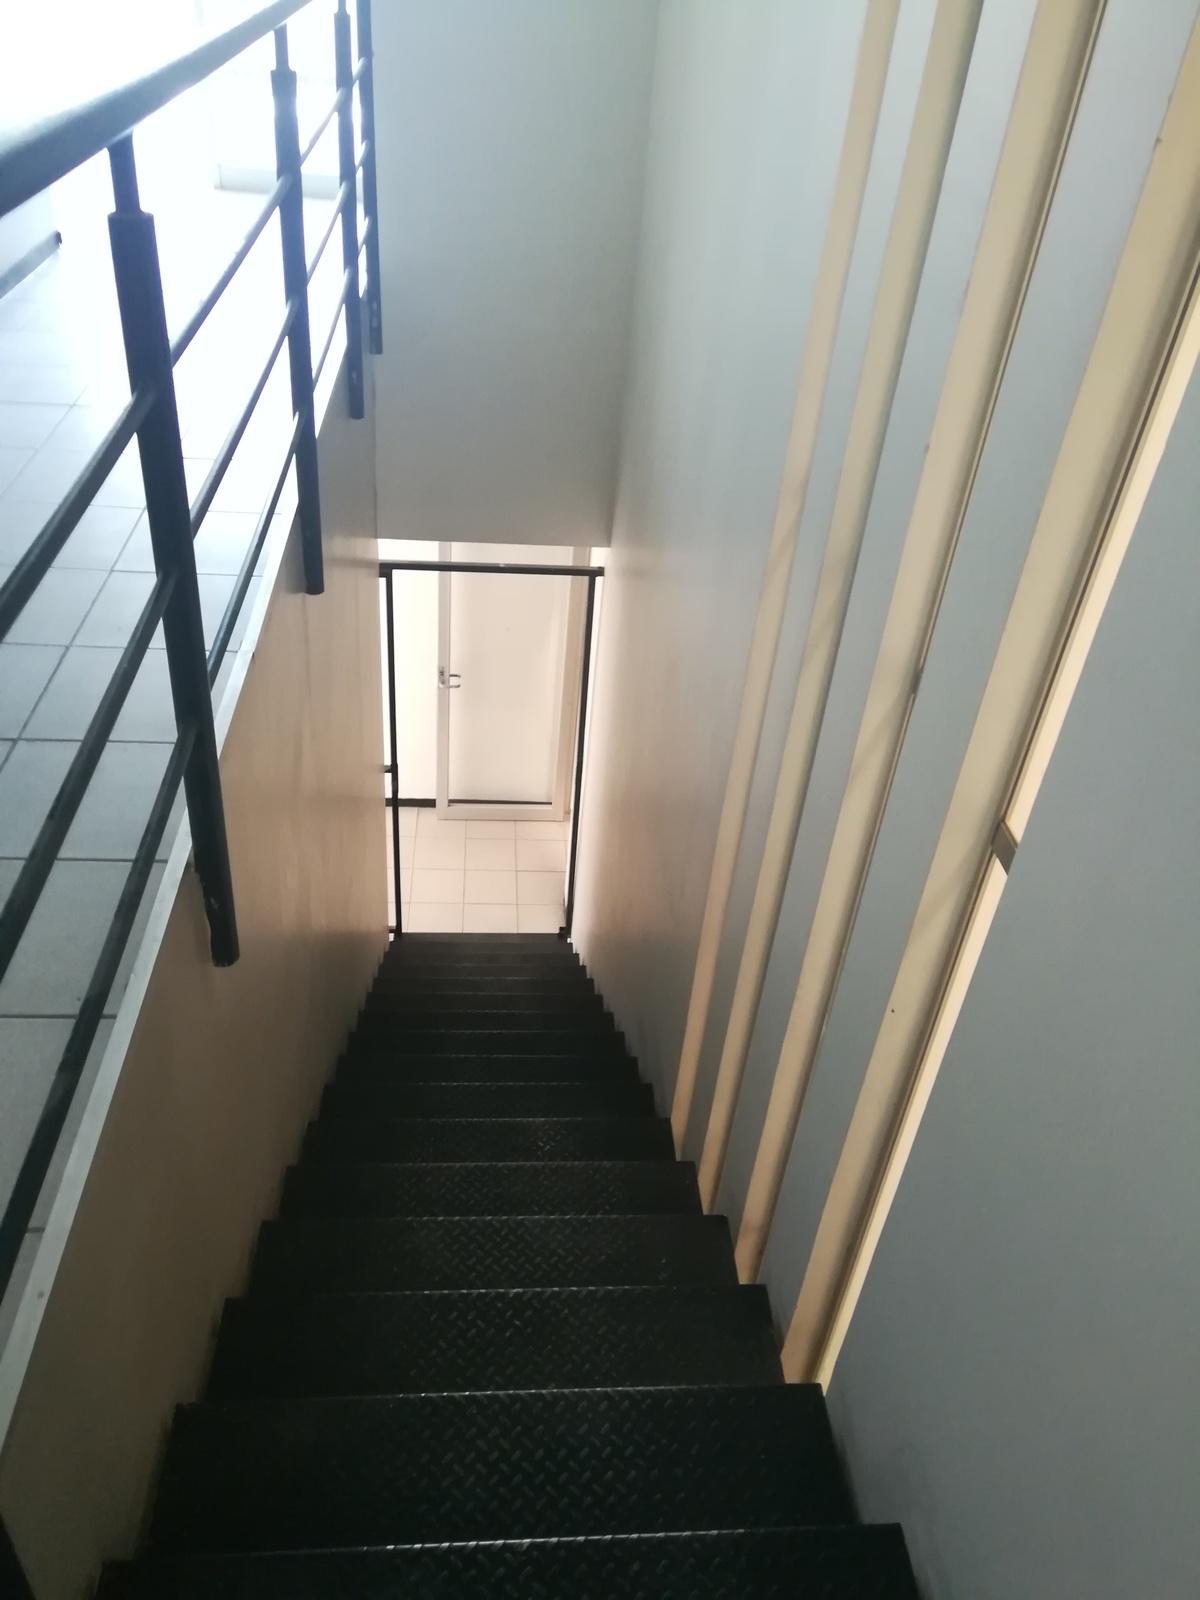 11 de 19: Escaleras de acceso al segundo nivel de oficinas